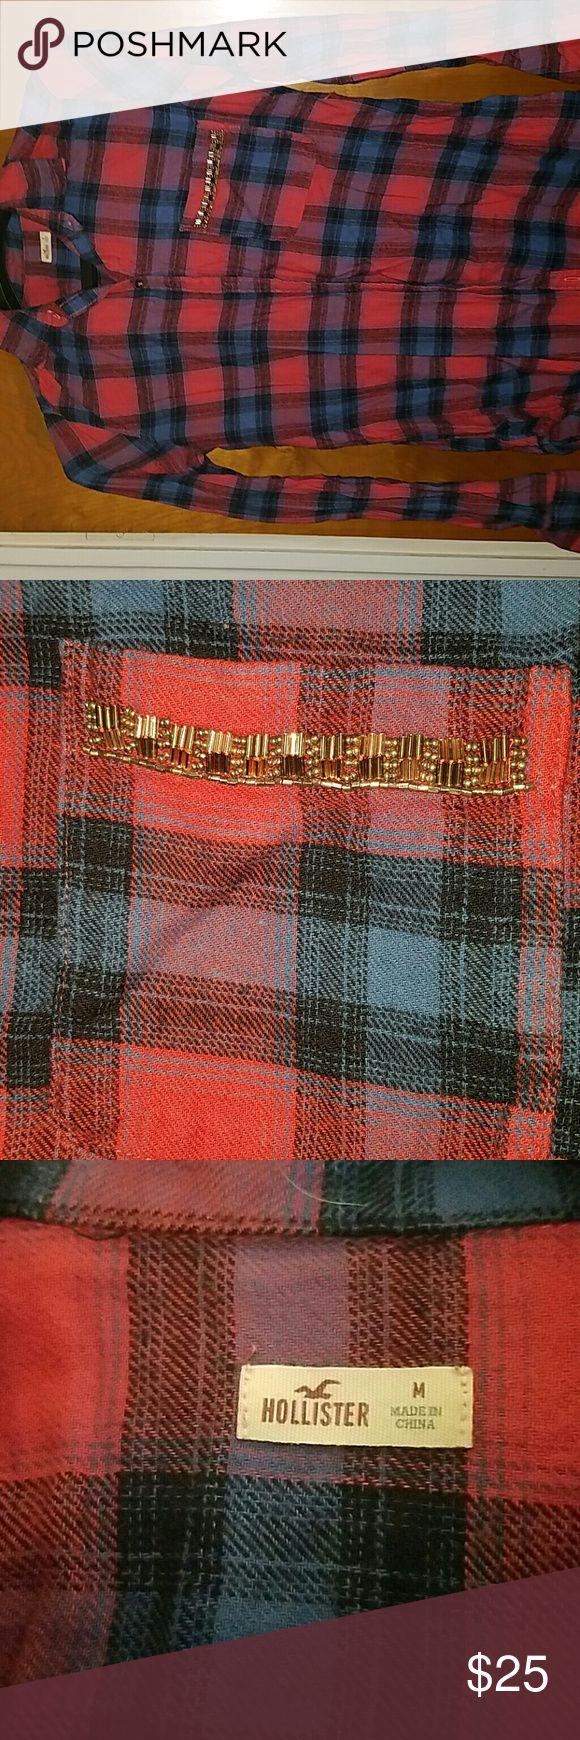 NWOT Hollister flannel shirt Size M Never worn button down flannel shirt from Hollister. Pink and blue flannel. Embellishment on pocket Hollister Tops Button Down Shirts